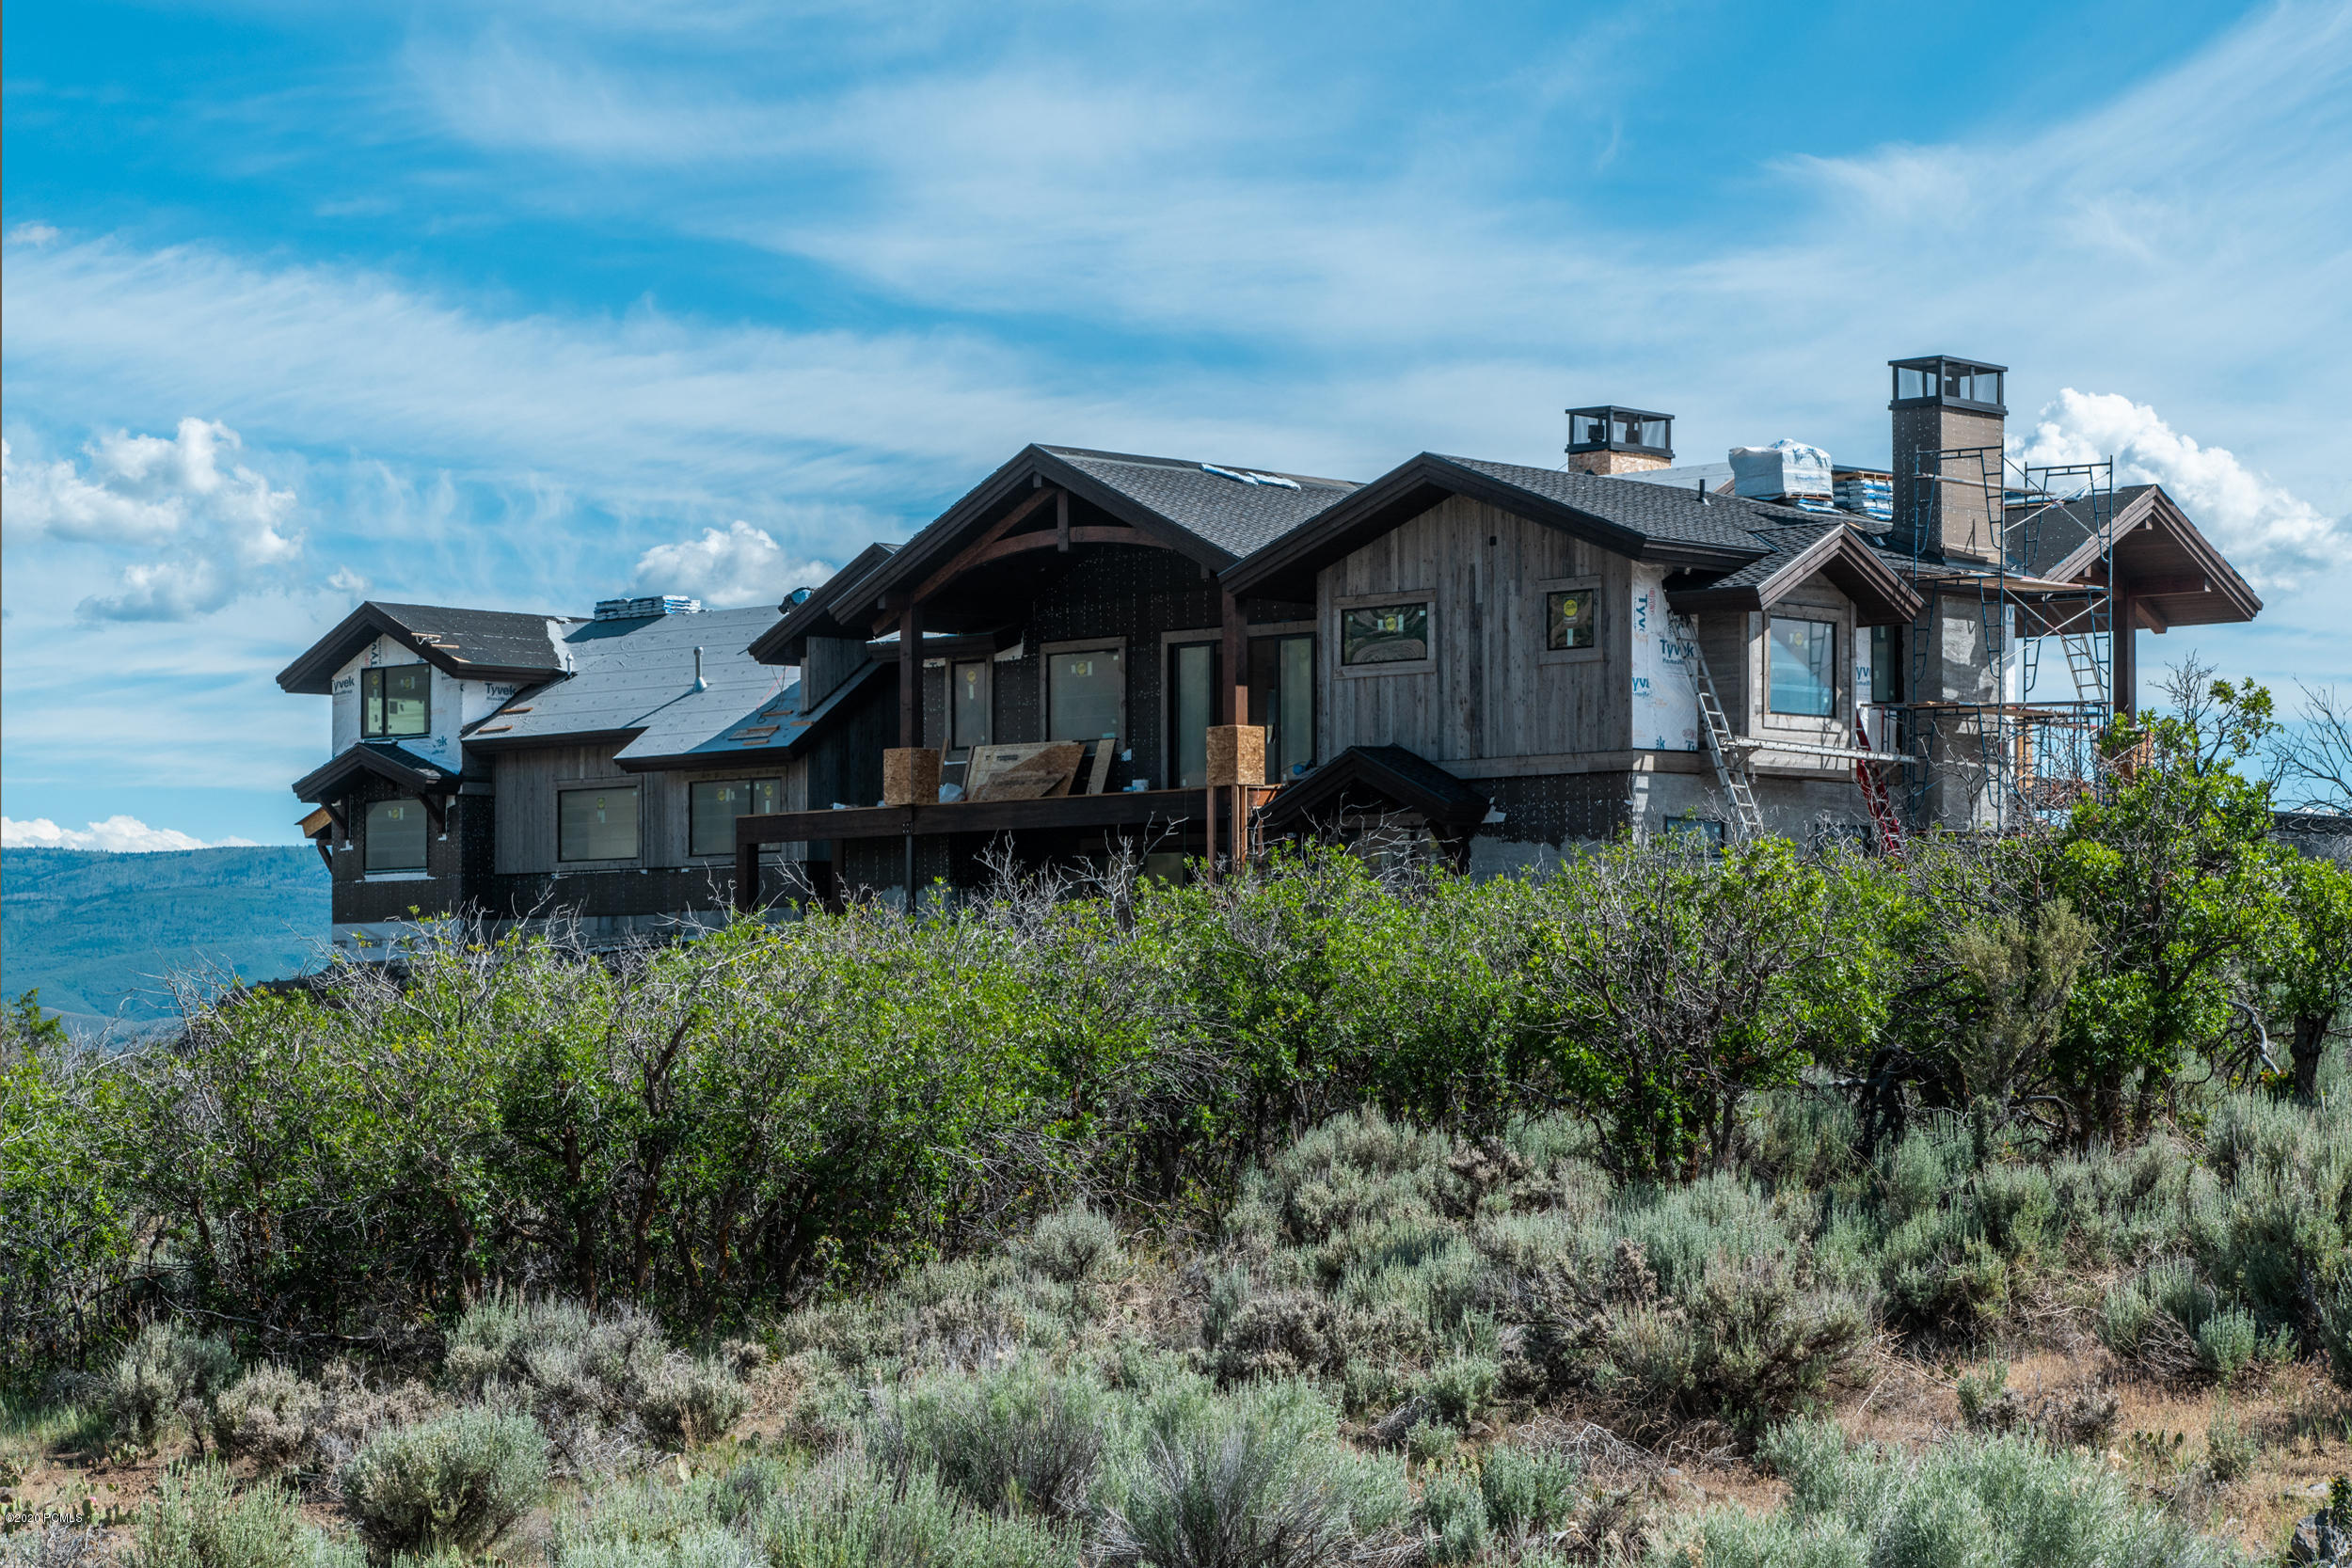 1932 Lookout Peak Cir (Lot 541), Heber City, Utah 84032, 5 Bedrooms Bedrooms, ,8 BathroomsBathrooms,Single Family,For Sale,Lookout Peak Cir (Lot 541),12002032